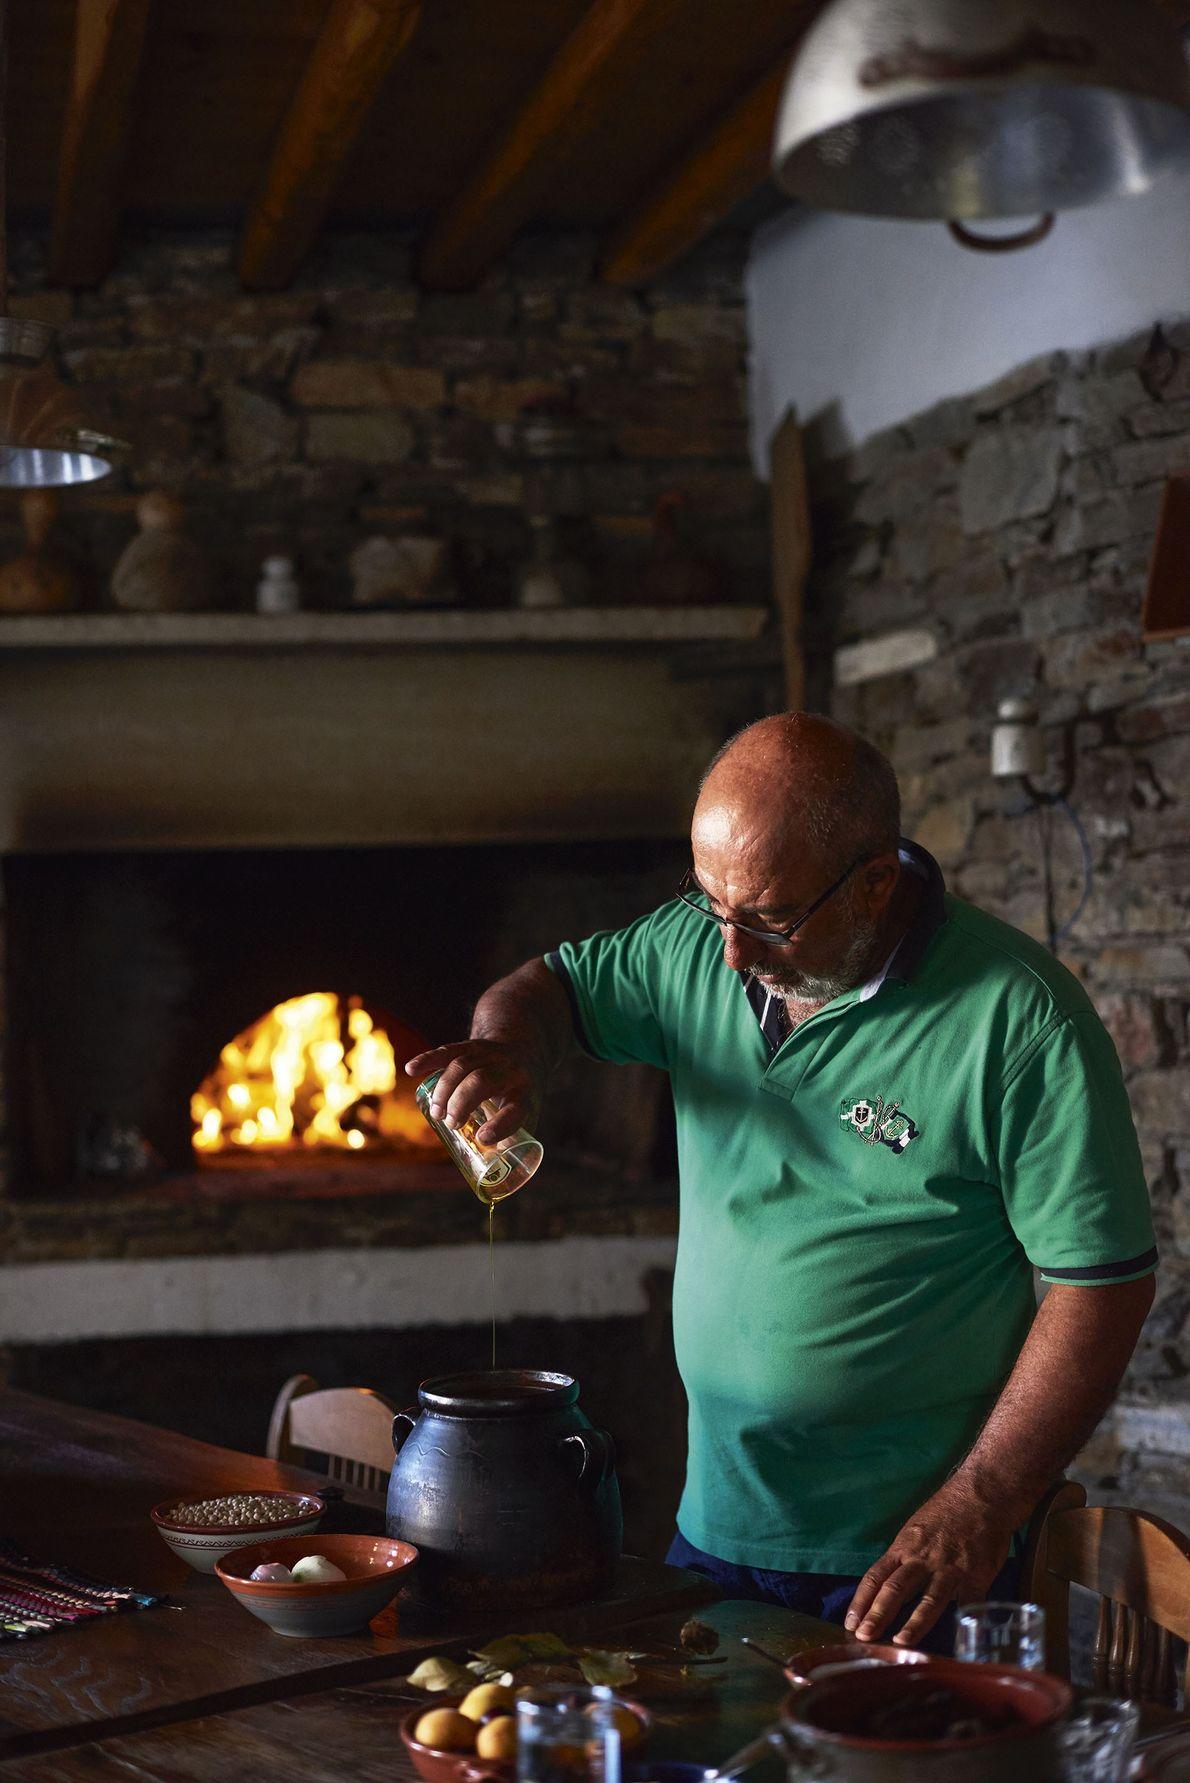 George preparing Sunday lunch.